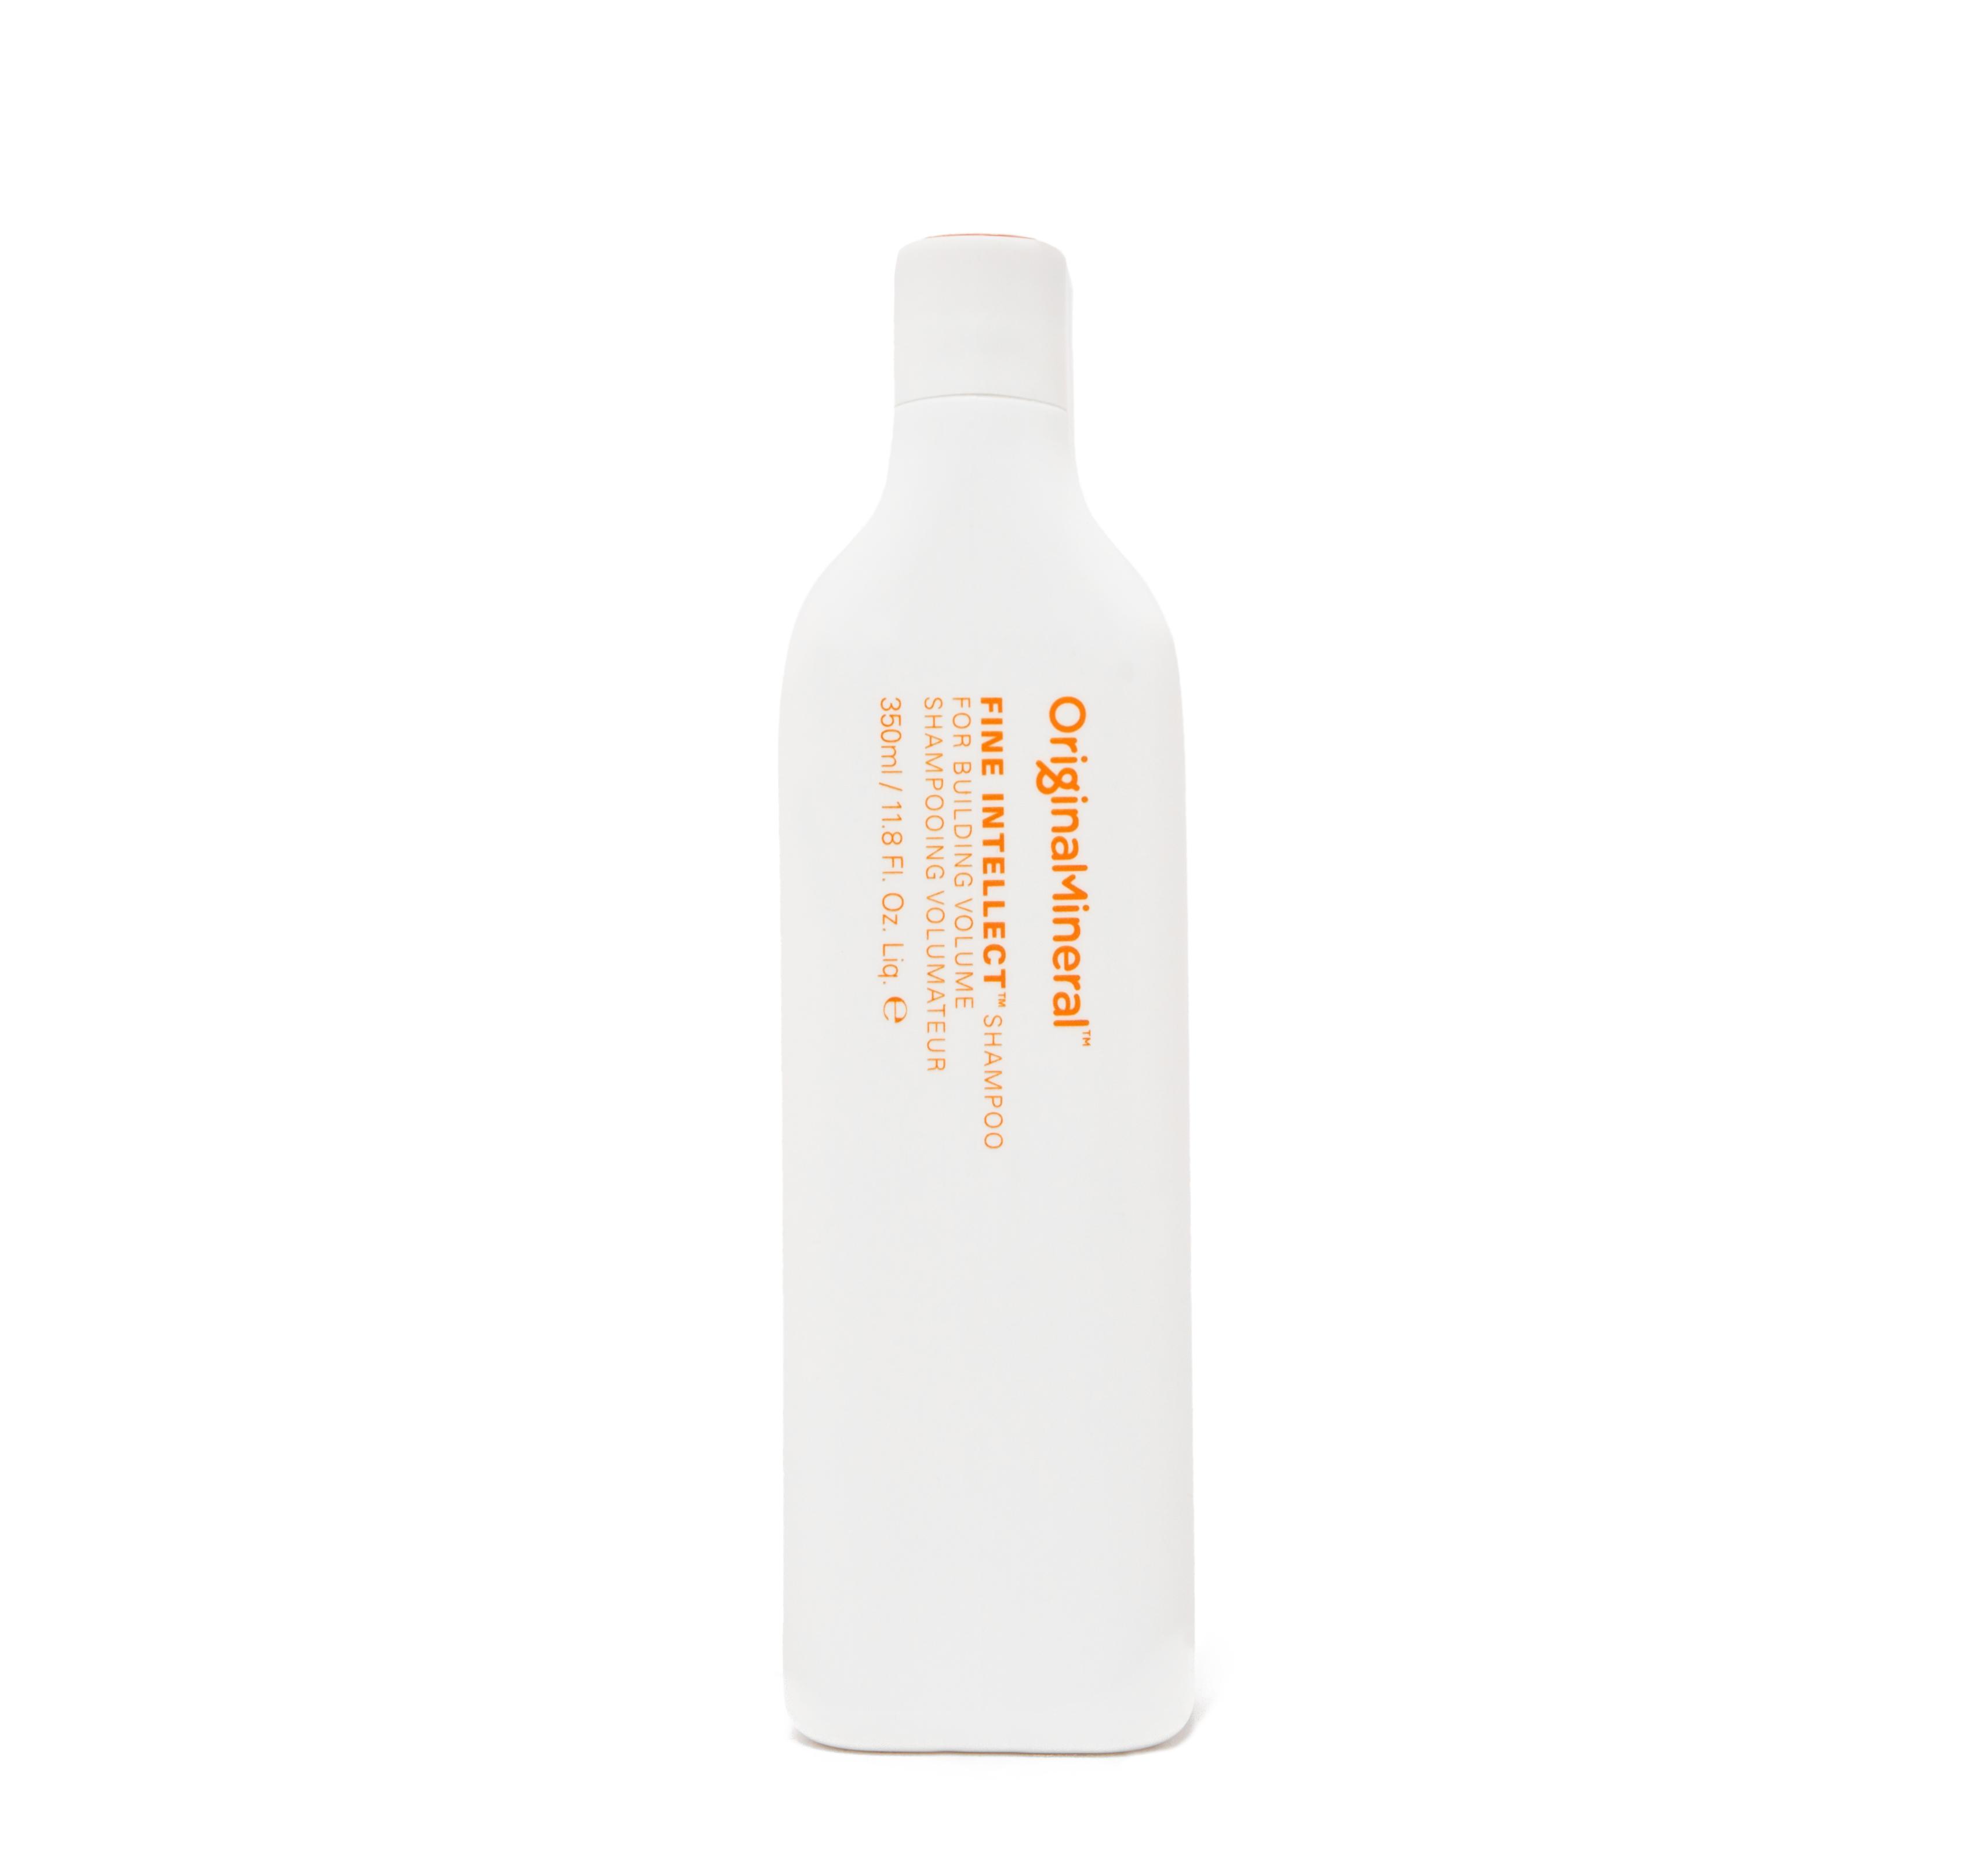 O&M Fine Intellect Šampon 350ml